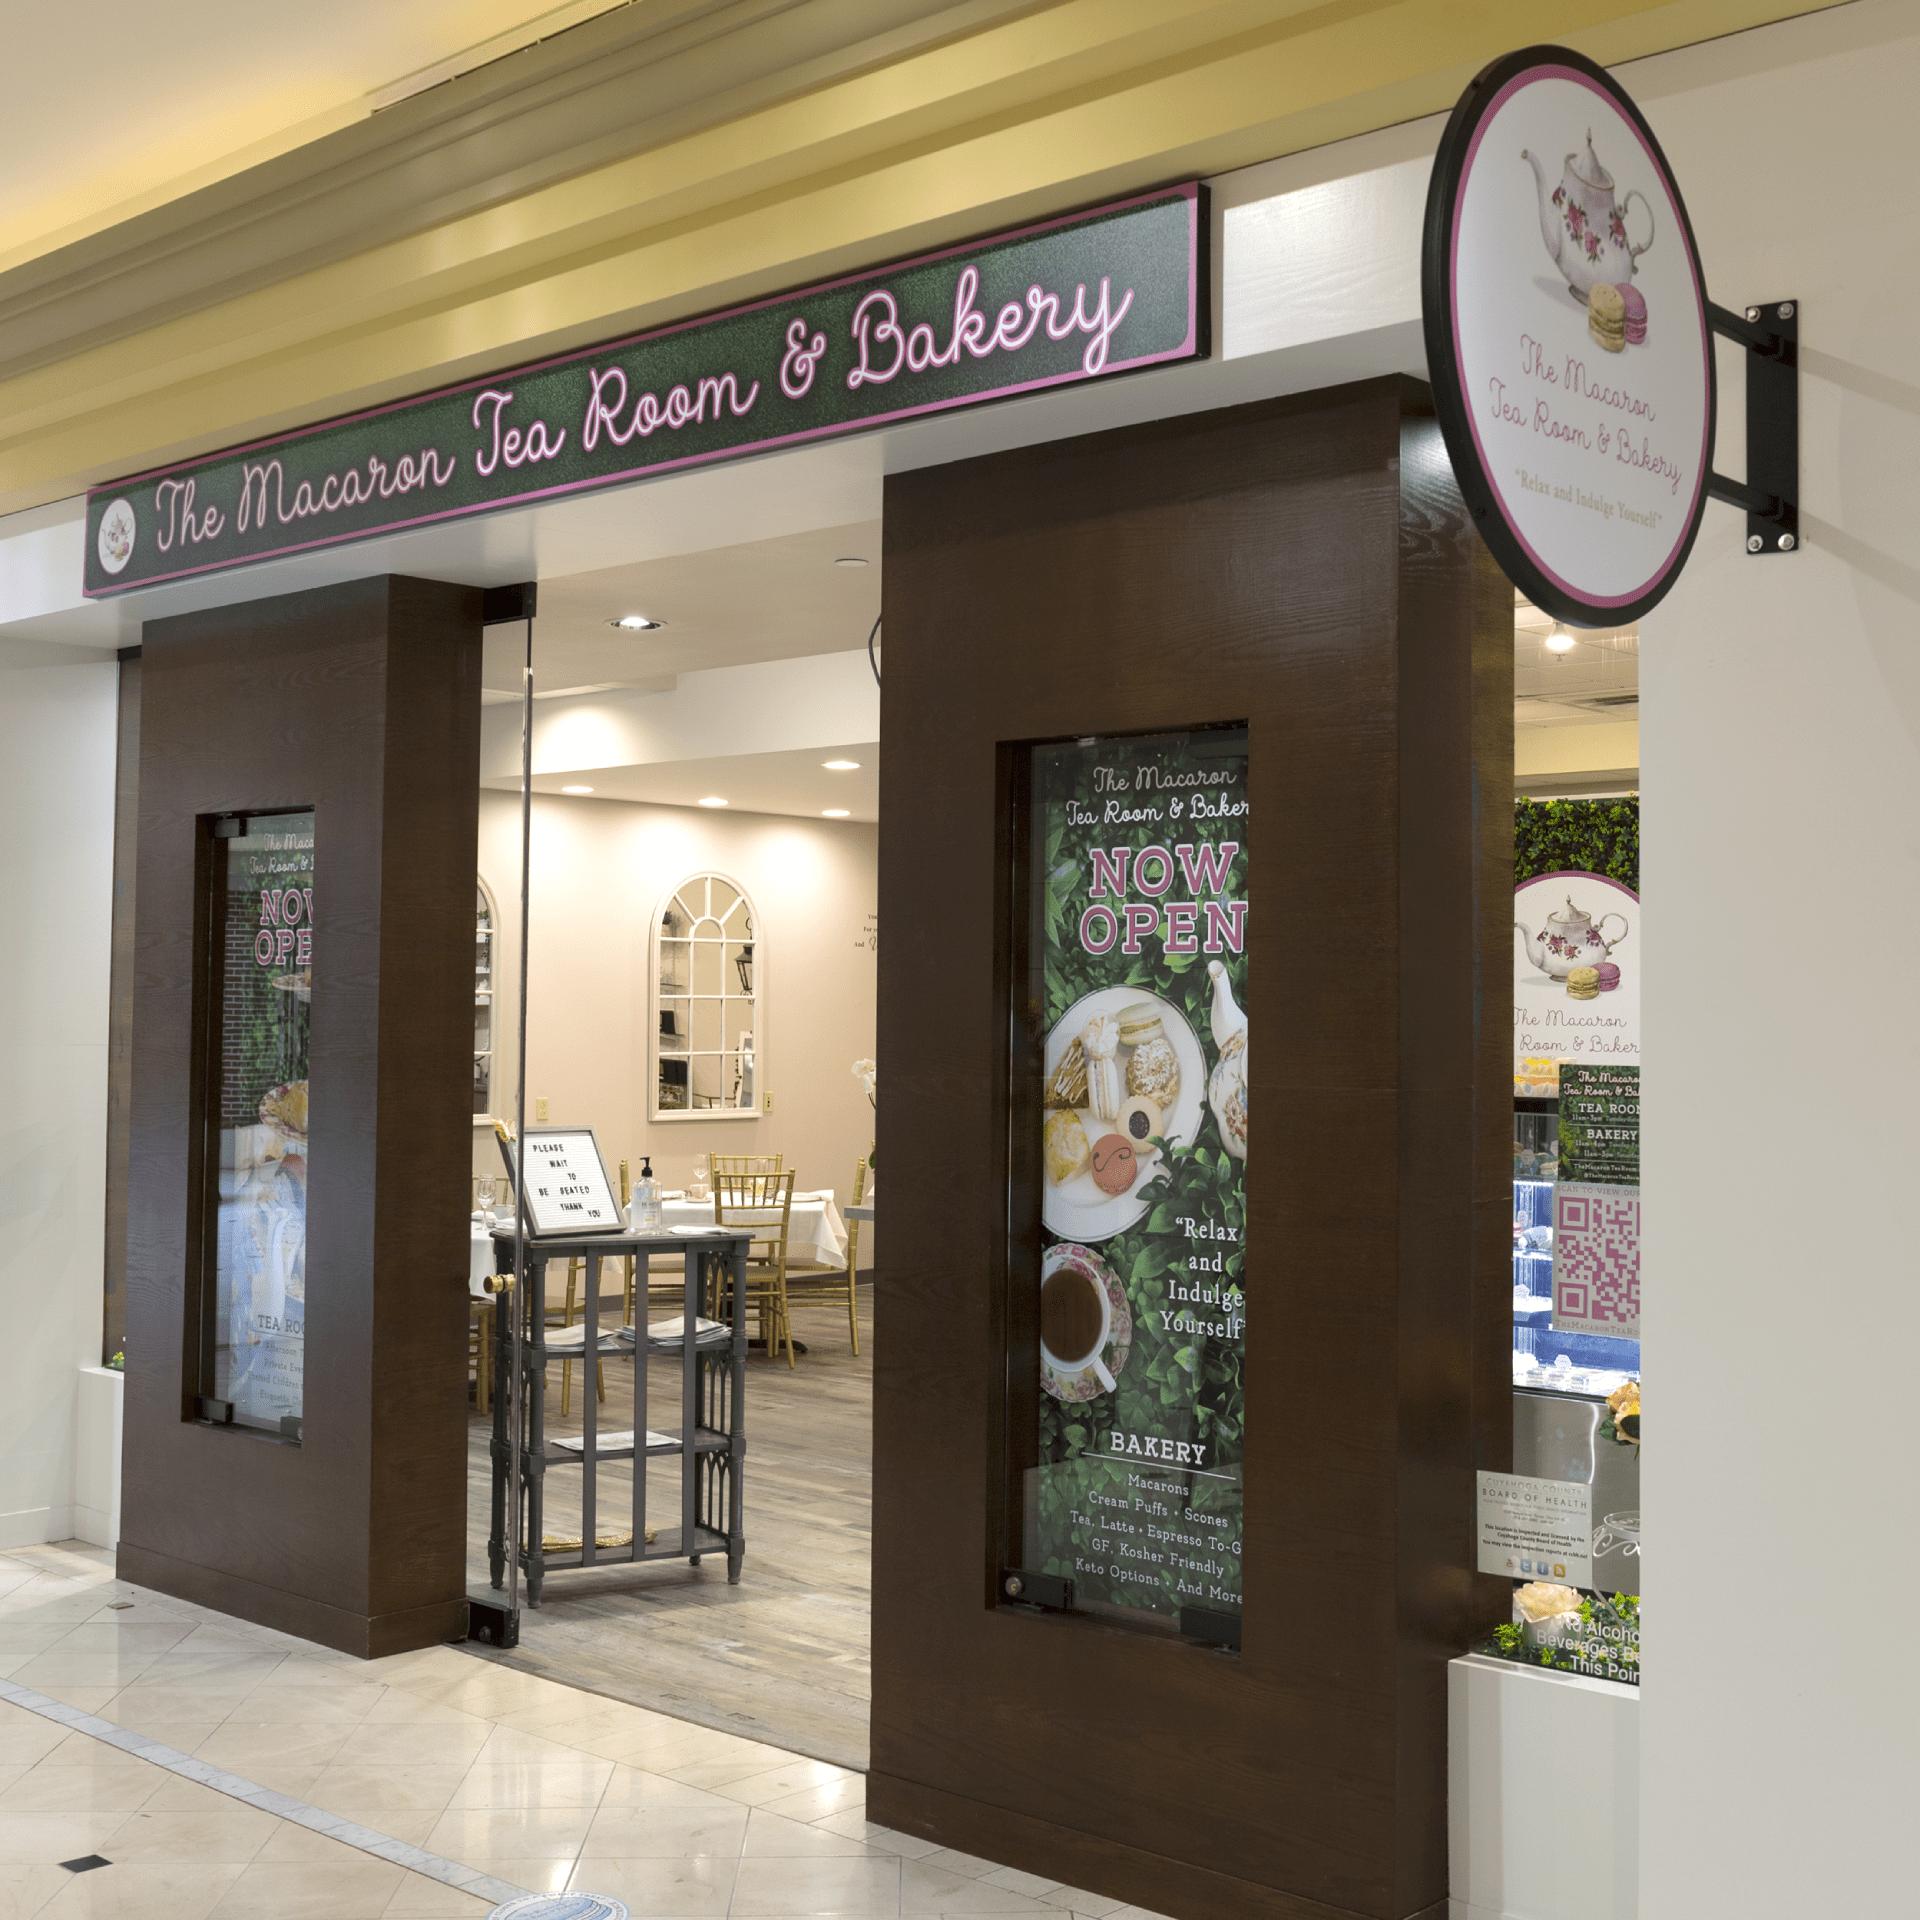 The Macaron Tea Room & Bakery